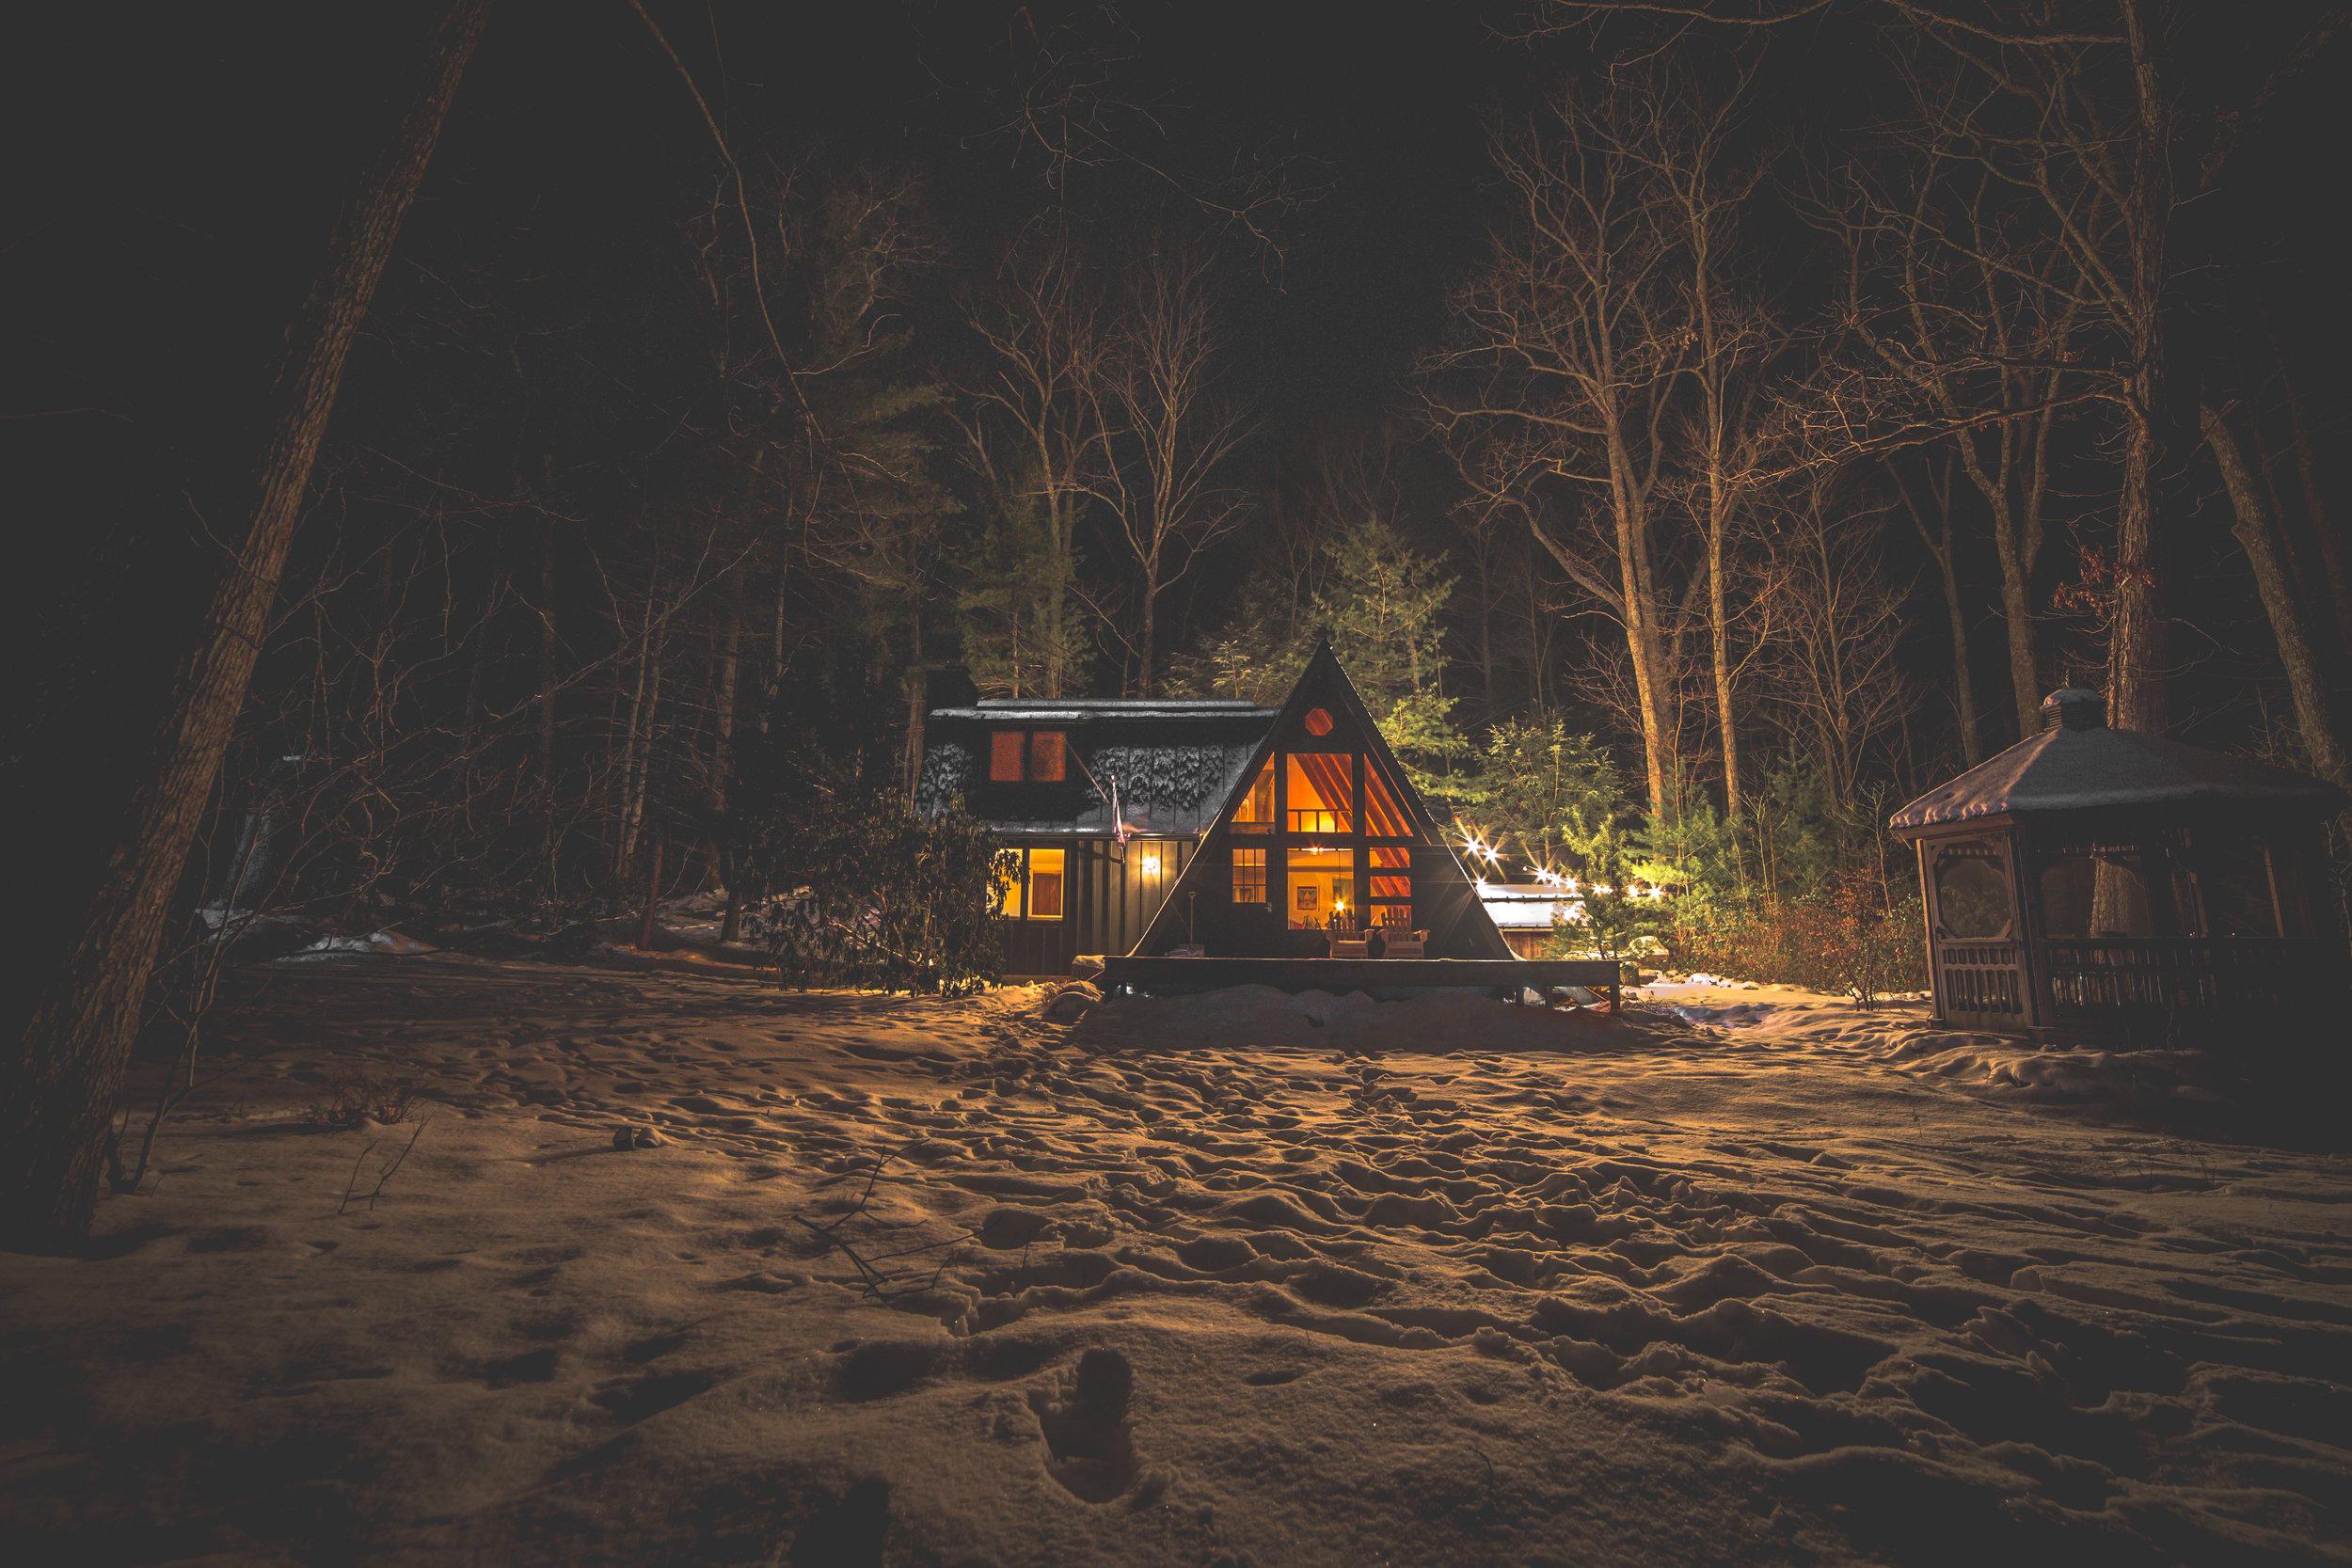 Airbnb Rental Property Exposure - Photo, Video, Cinemagraphs & Instagram Exposure